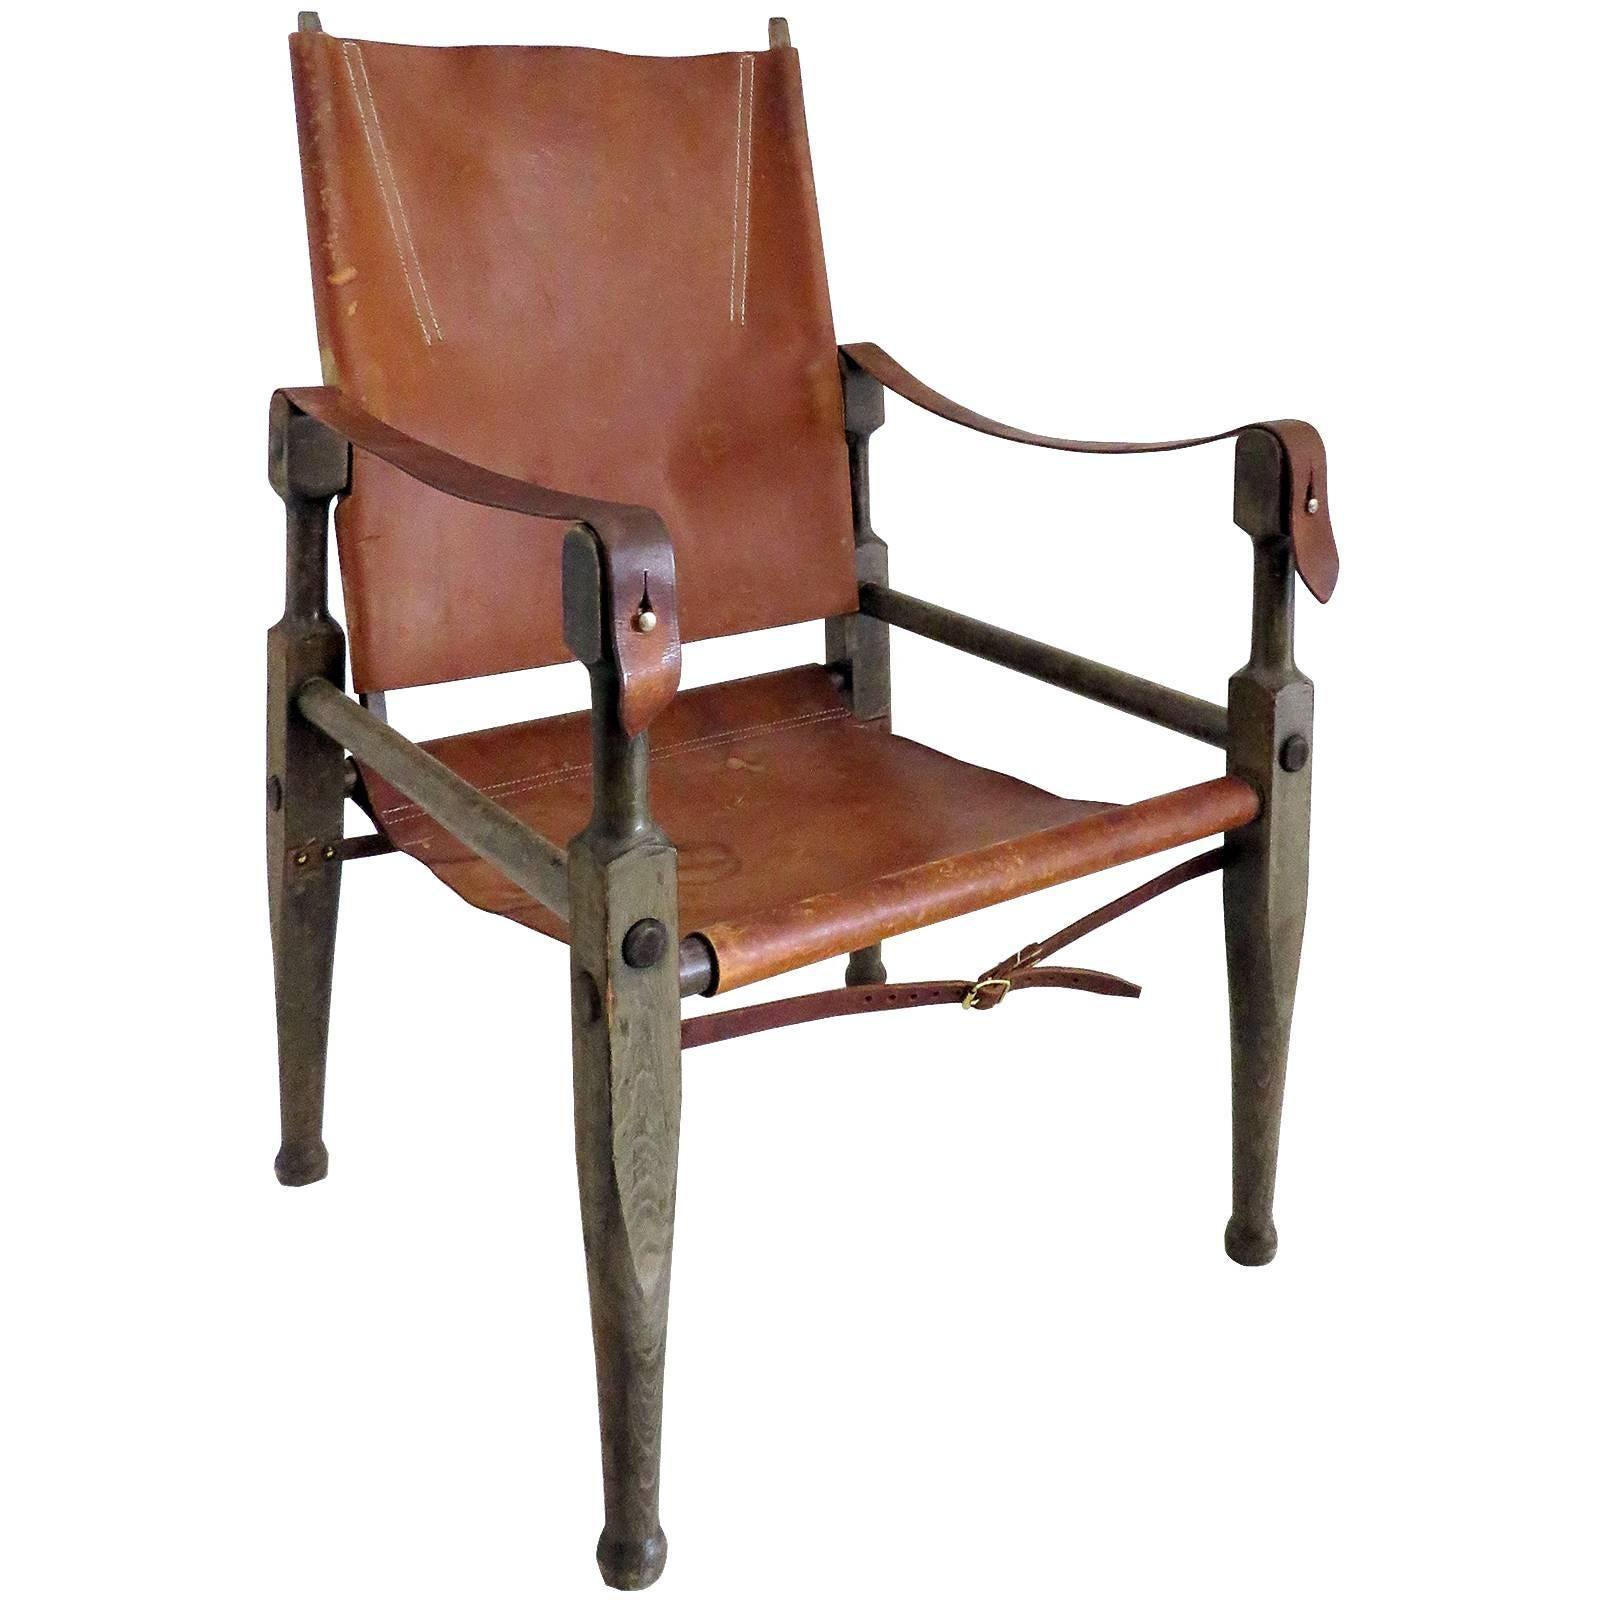 Wilhelm Kienzle Safari Chair, 1950